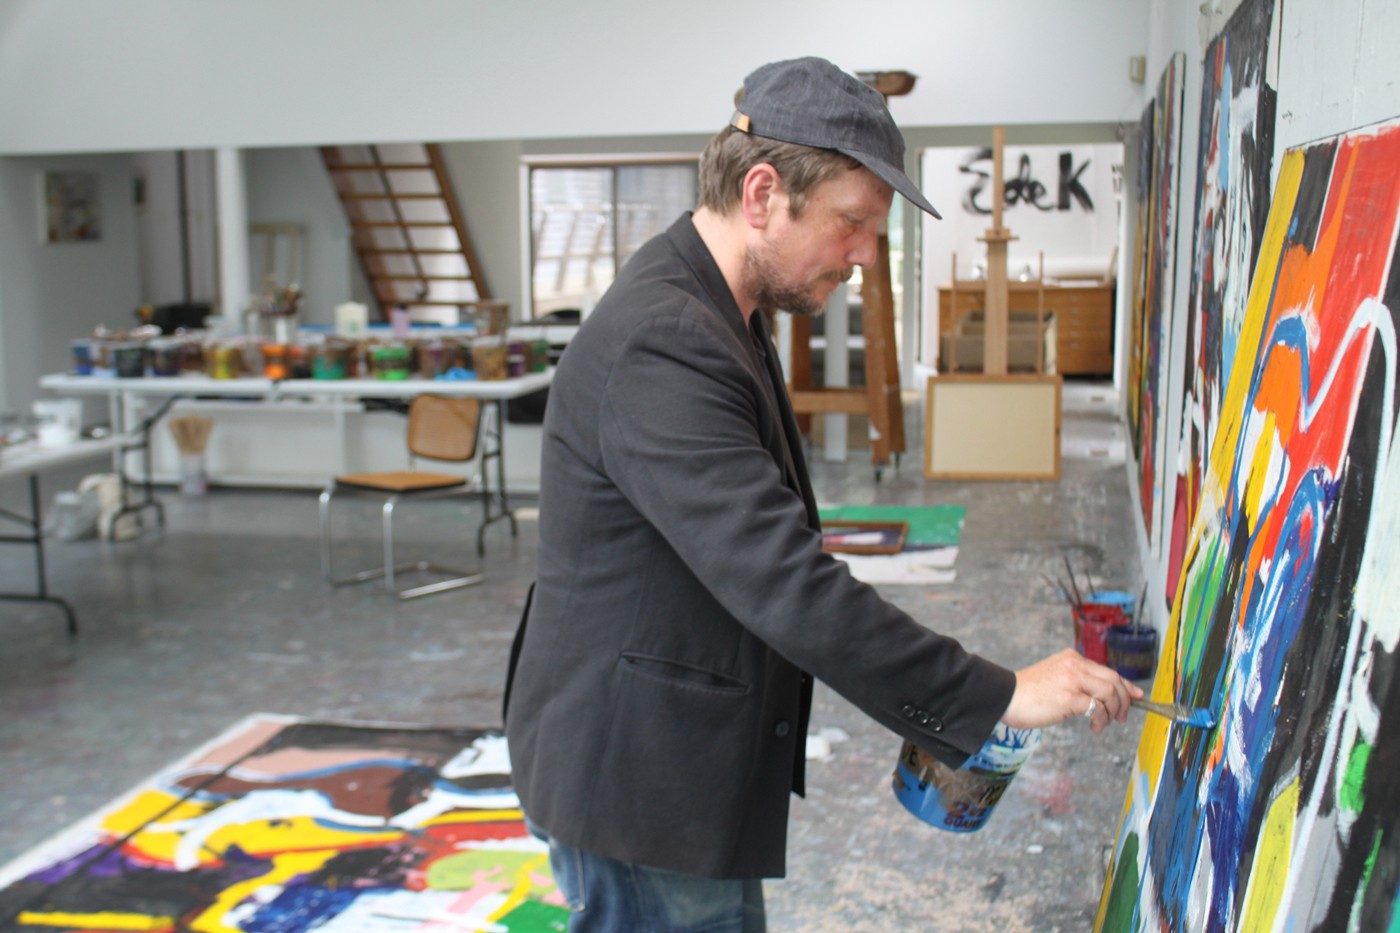 joe bradley interview elaine de kooning house artist residency